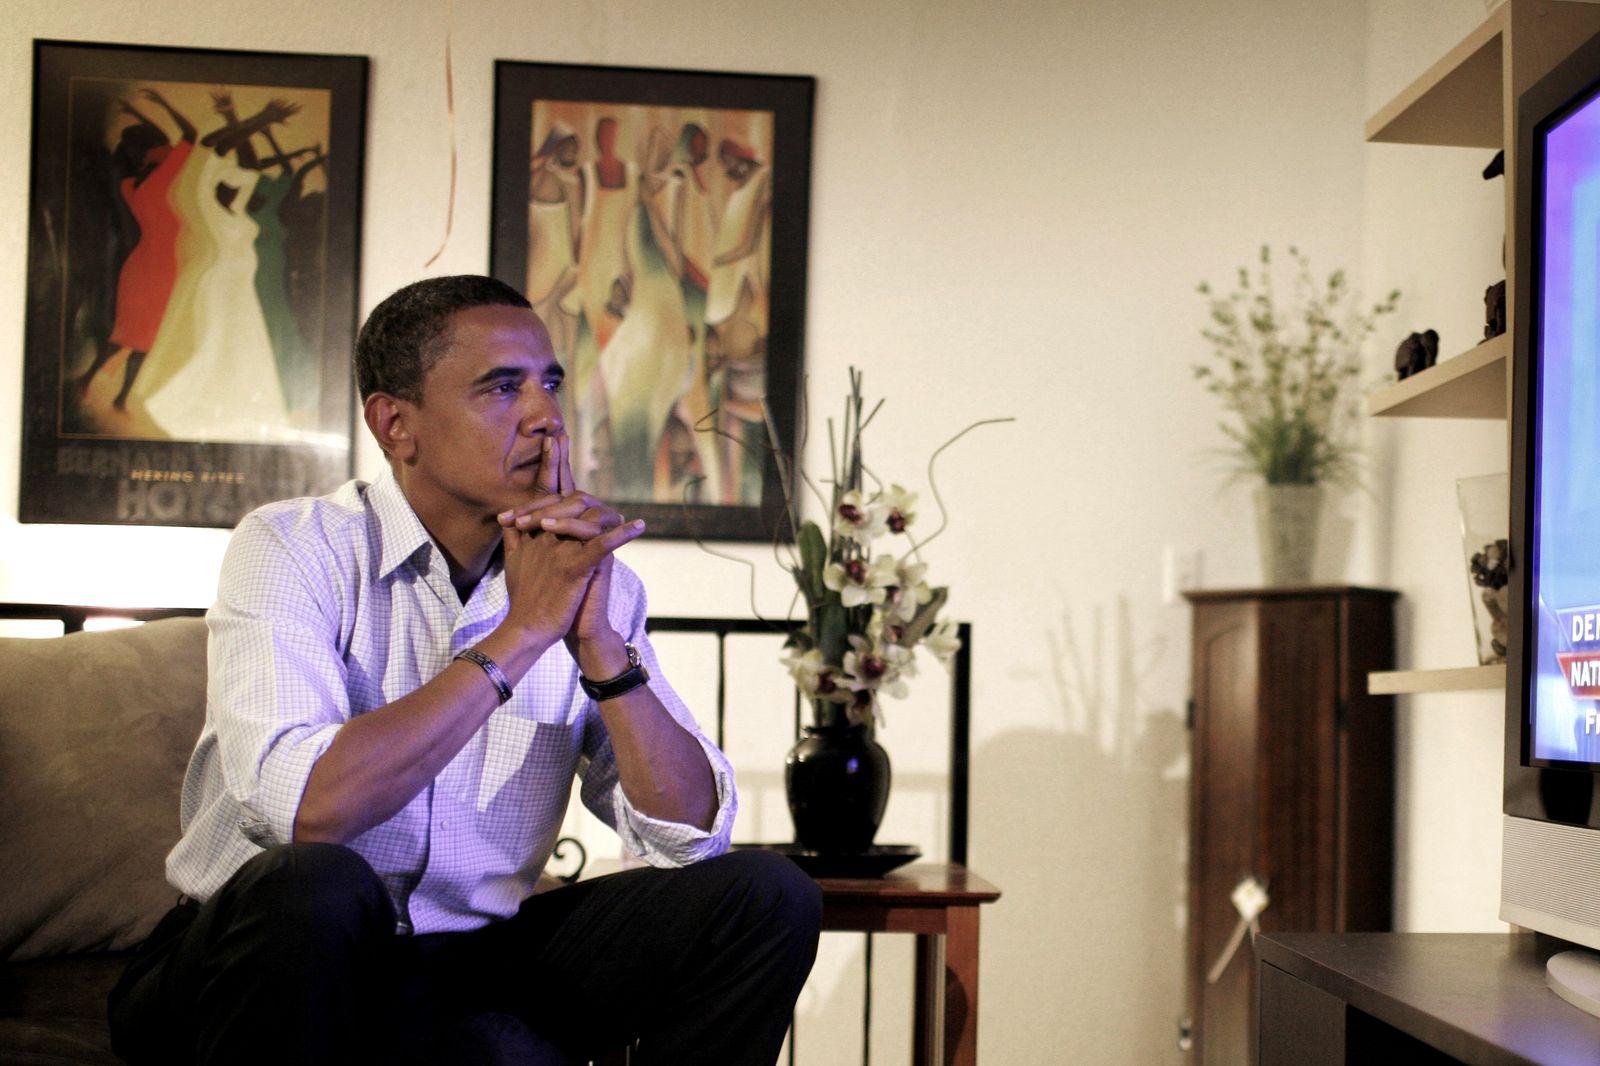 Senator Barack Obama On The Campaign Trail